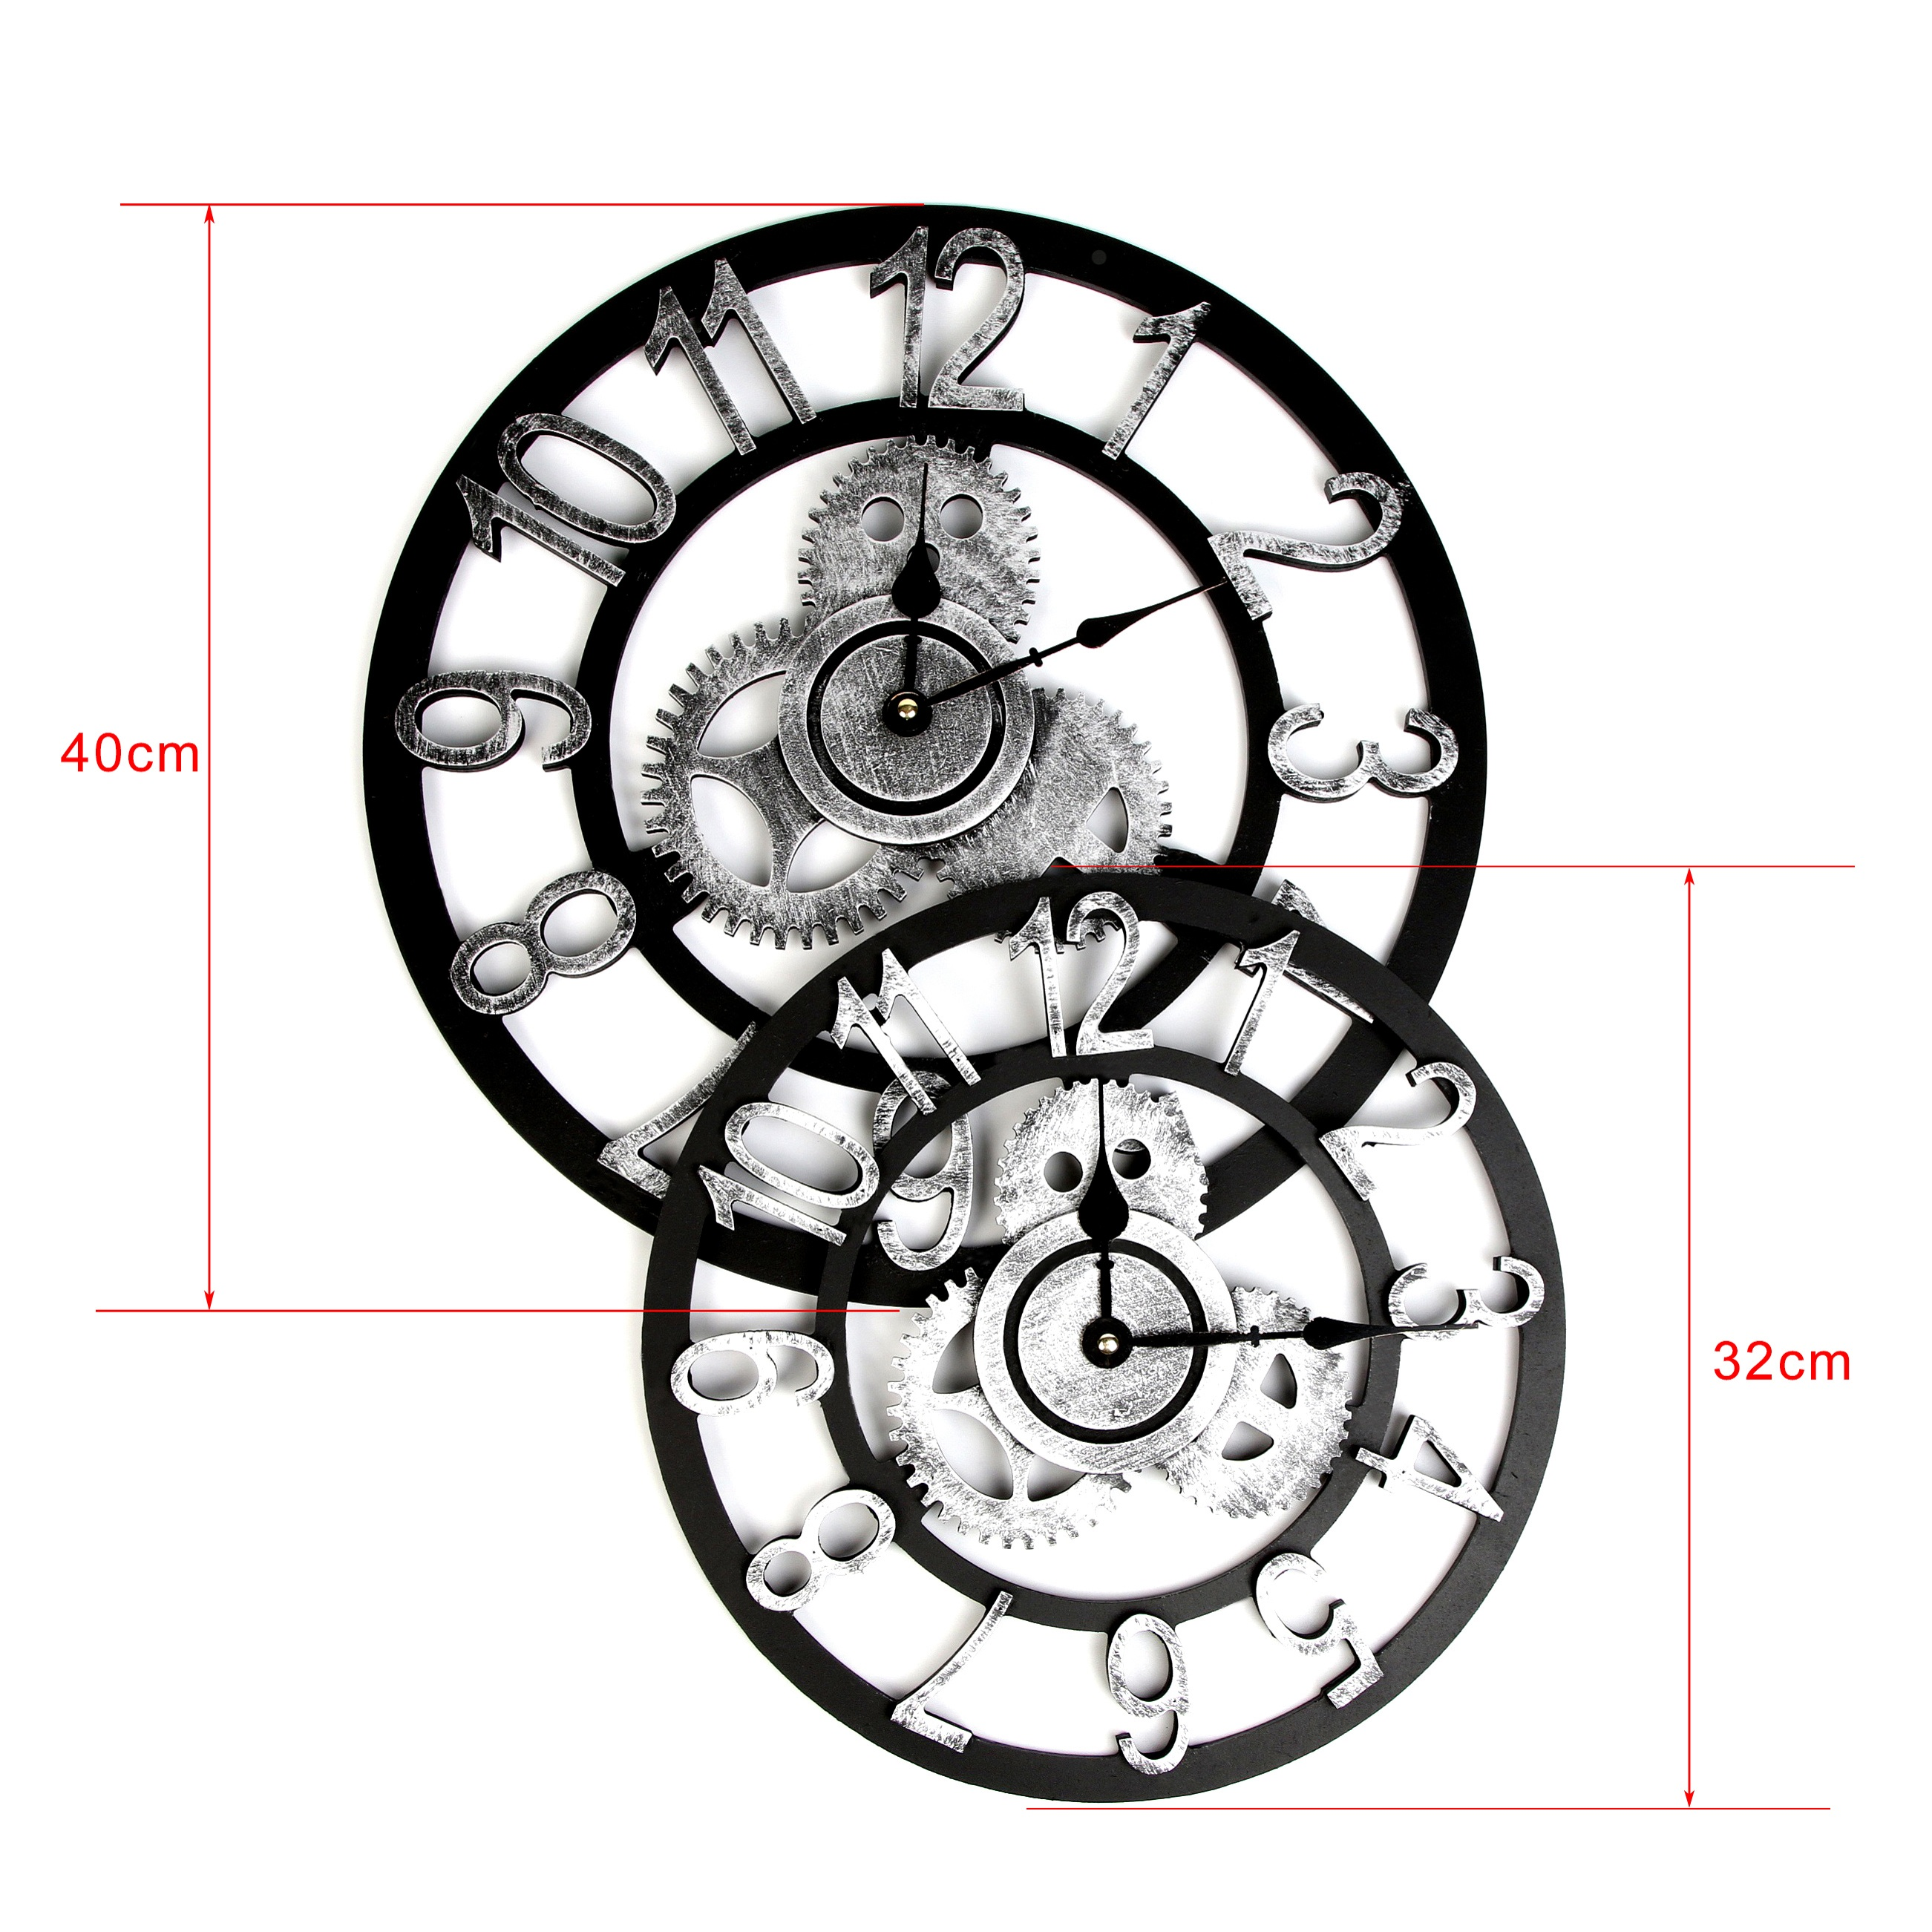 Vintage Roman Clock Retro European Gear Wall Clock European Steampunk Gear Wall Home Decoration Modern Design 3d Wall Clock 2019